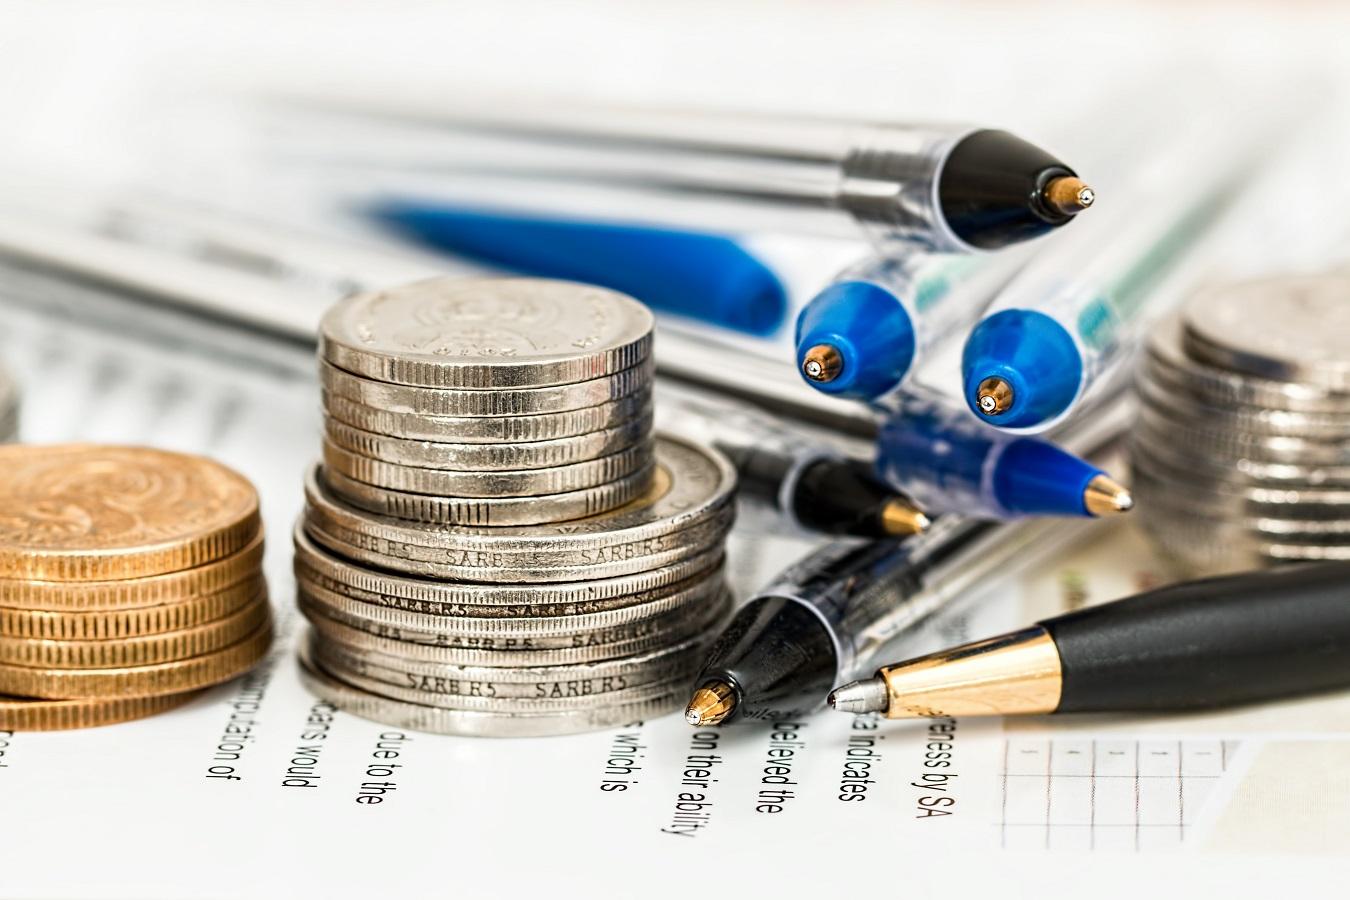 coins beside pens